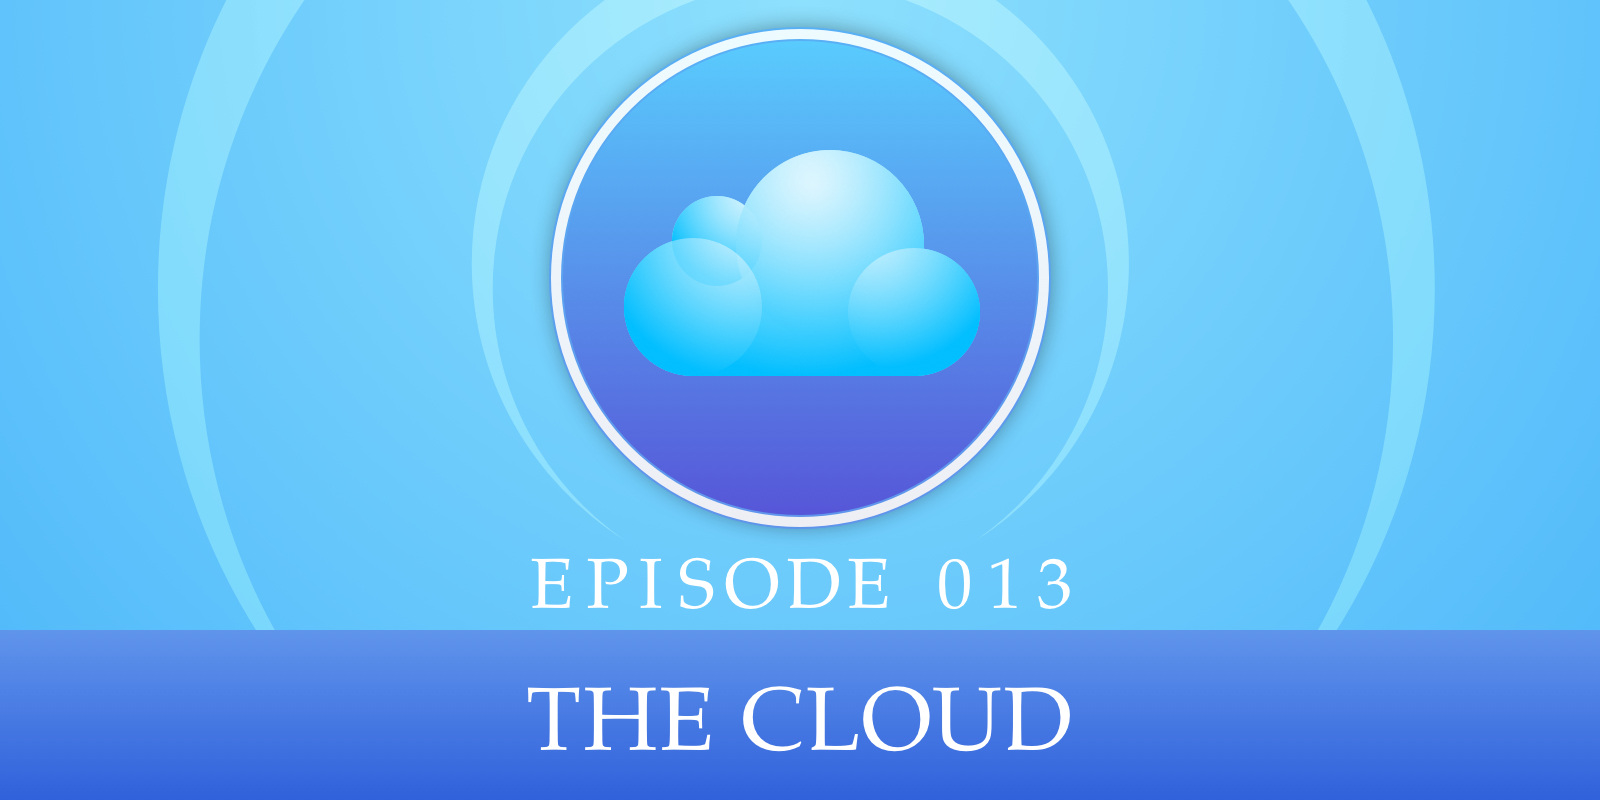 Episode 013: The Cloud